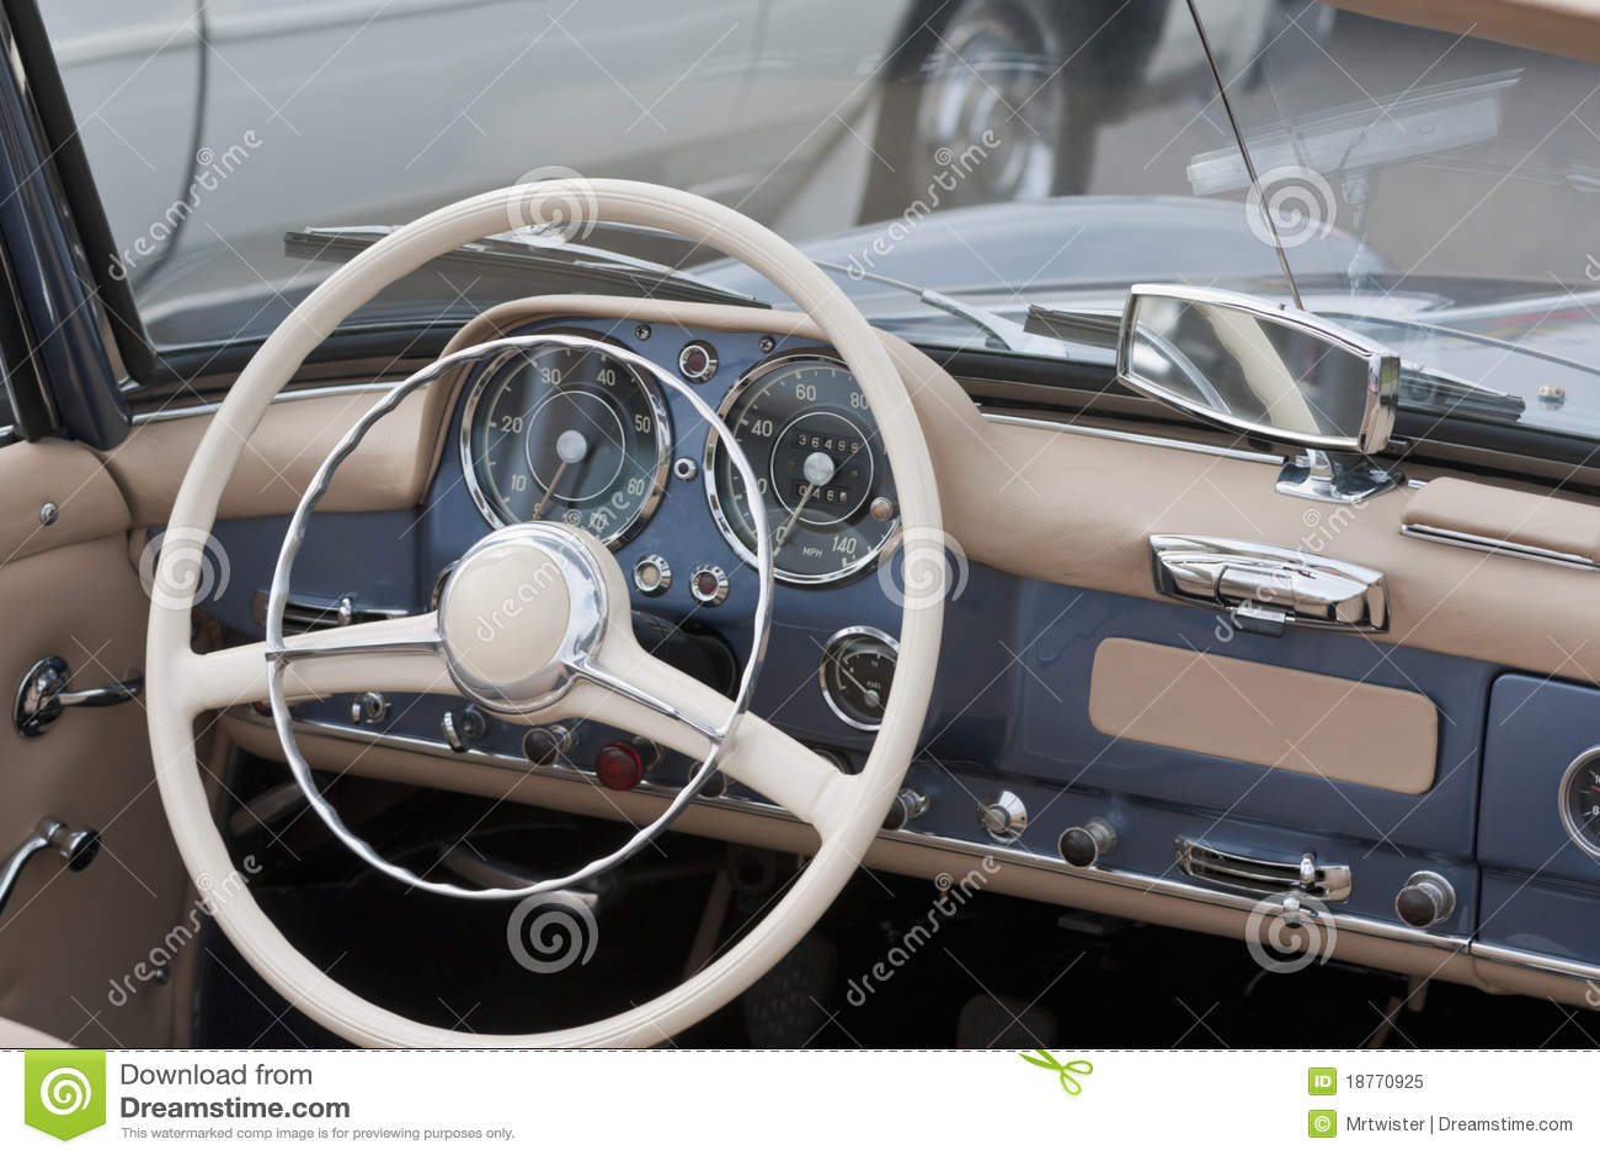 car interior stock image image of past luxury speedometer 18770925. Black Bedroom Furniture Sets. Home Design Ideas